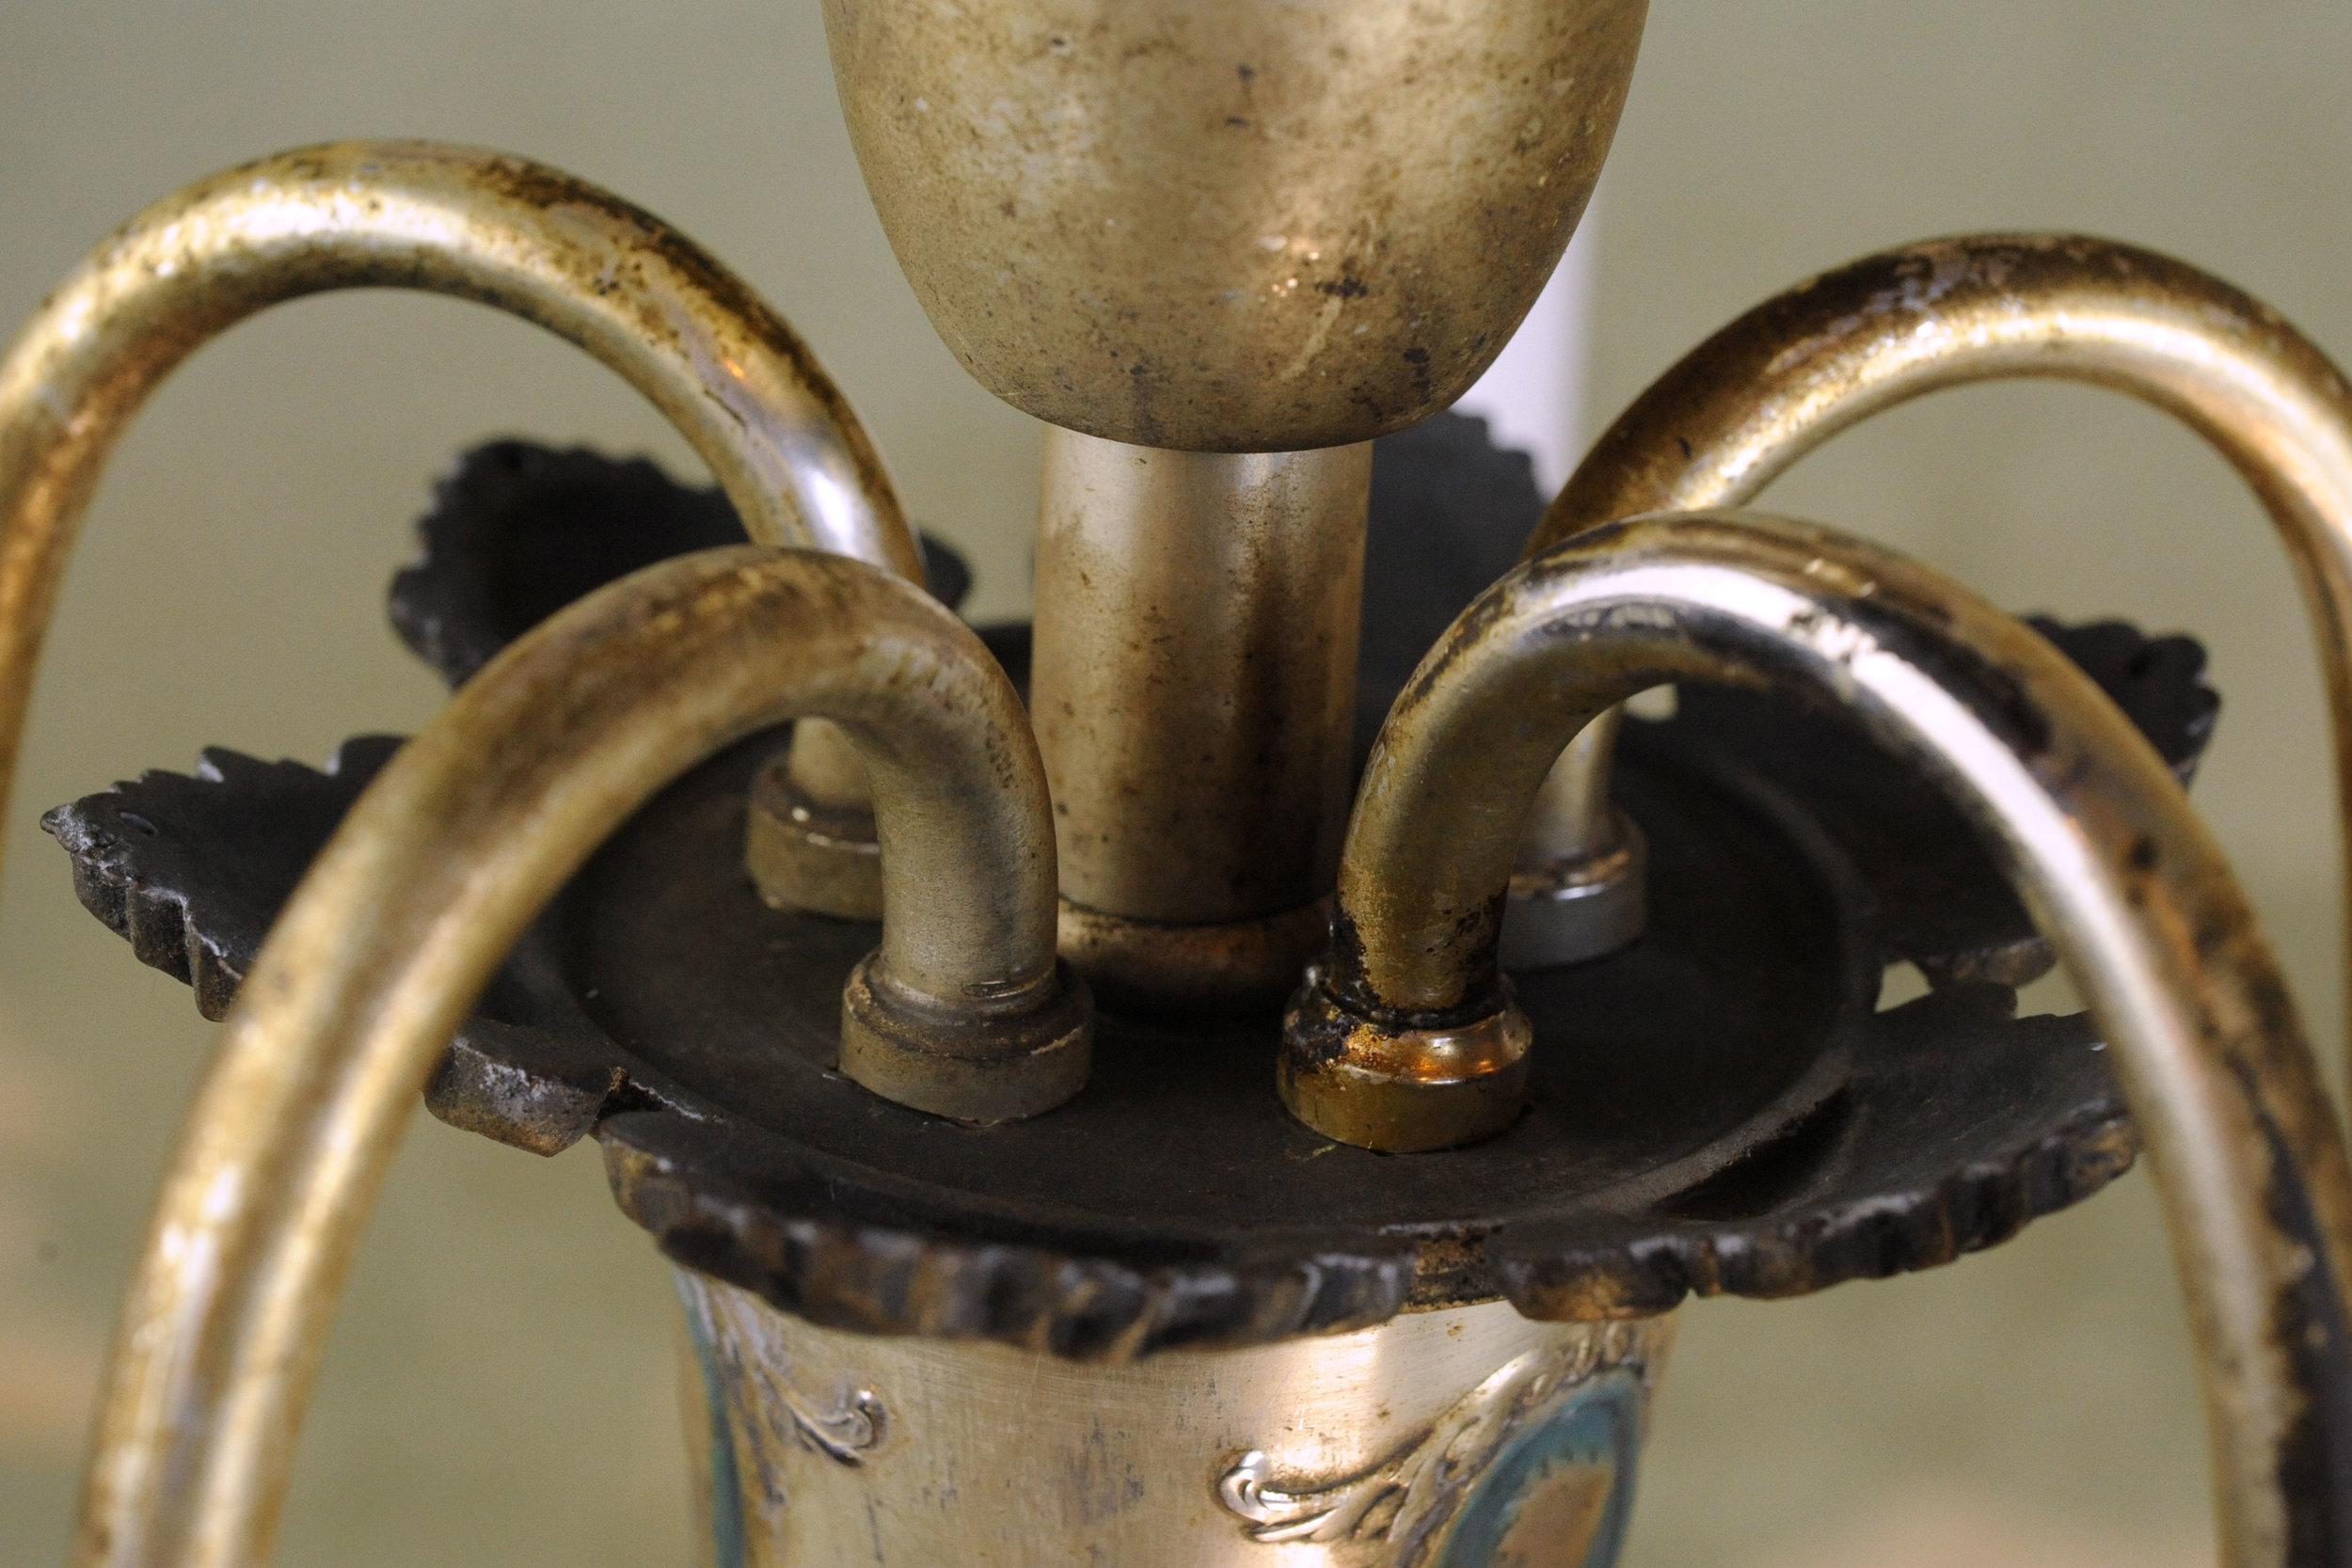 46884-silver-chandelier-five-arm-detail.jpg